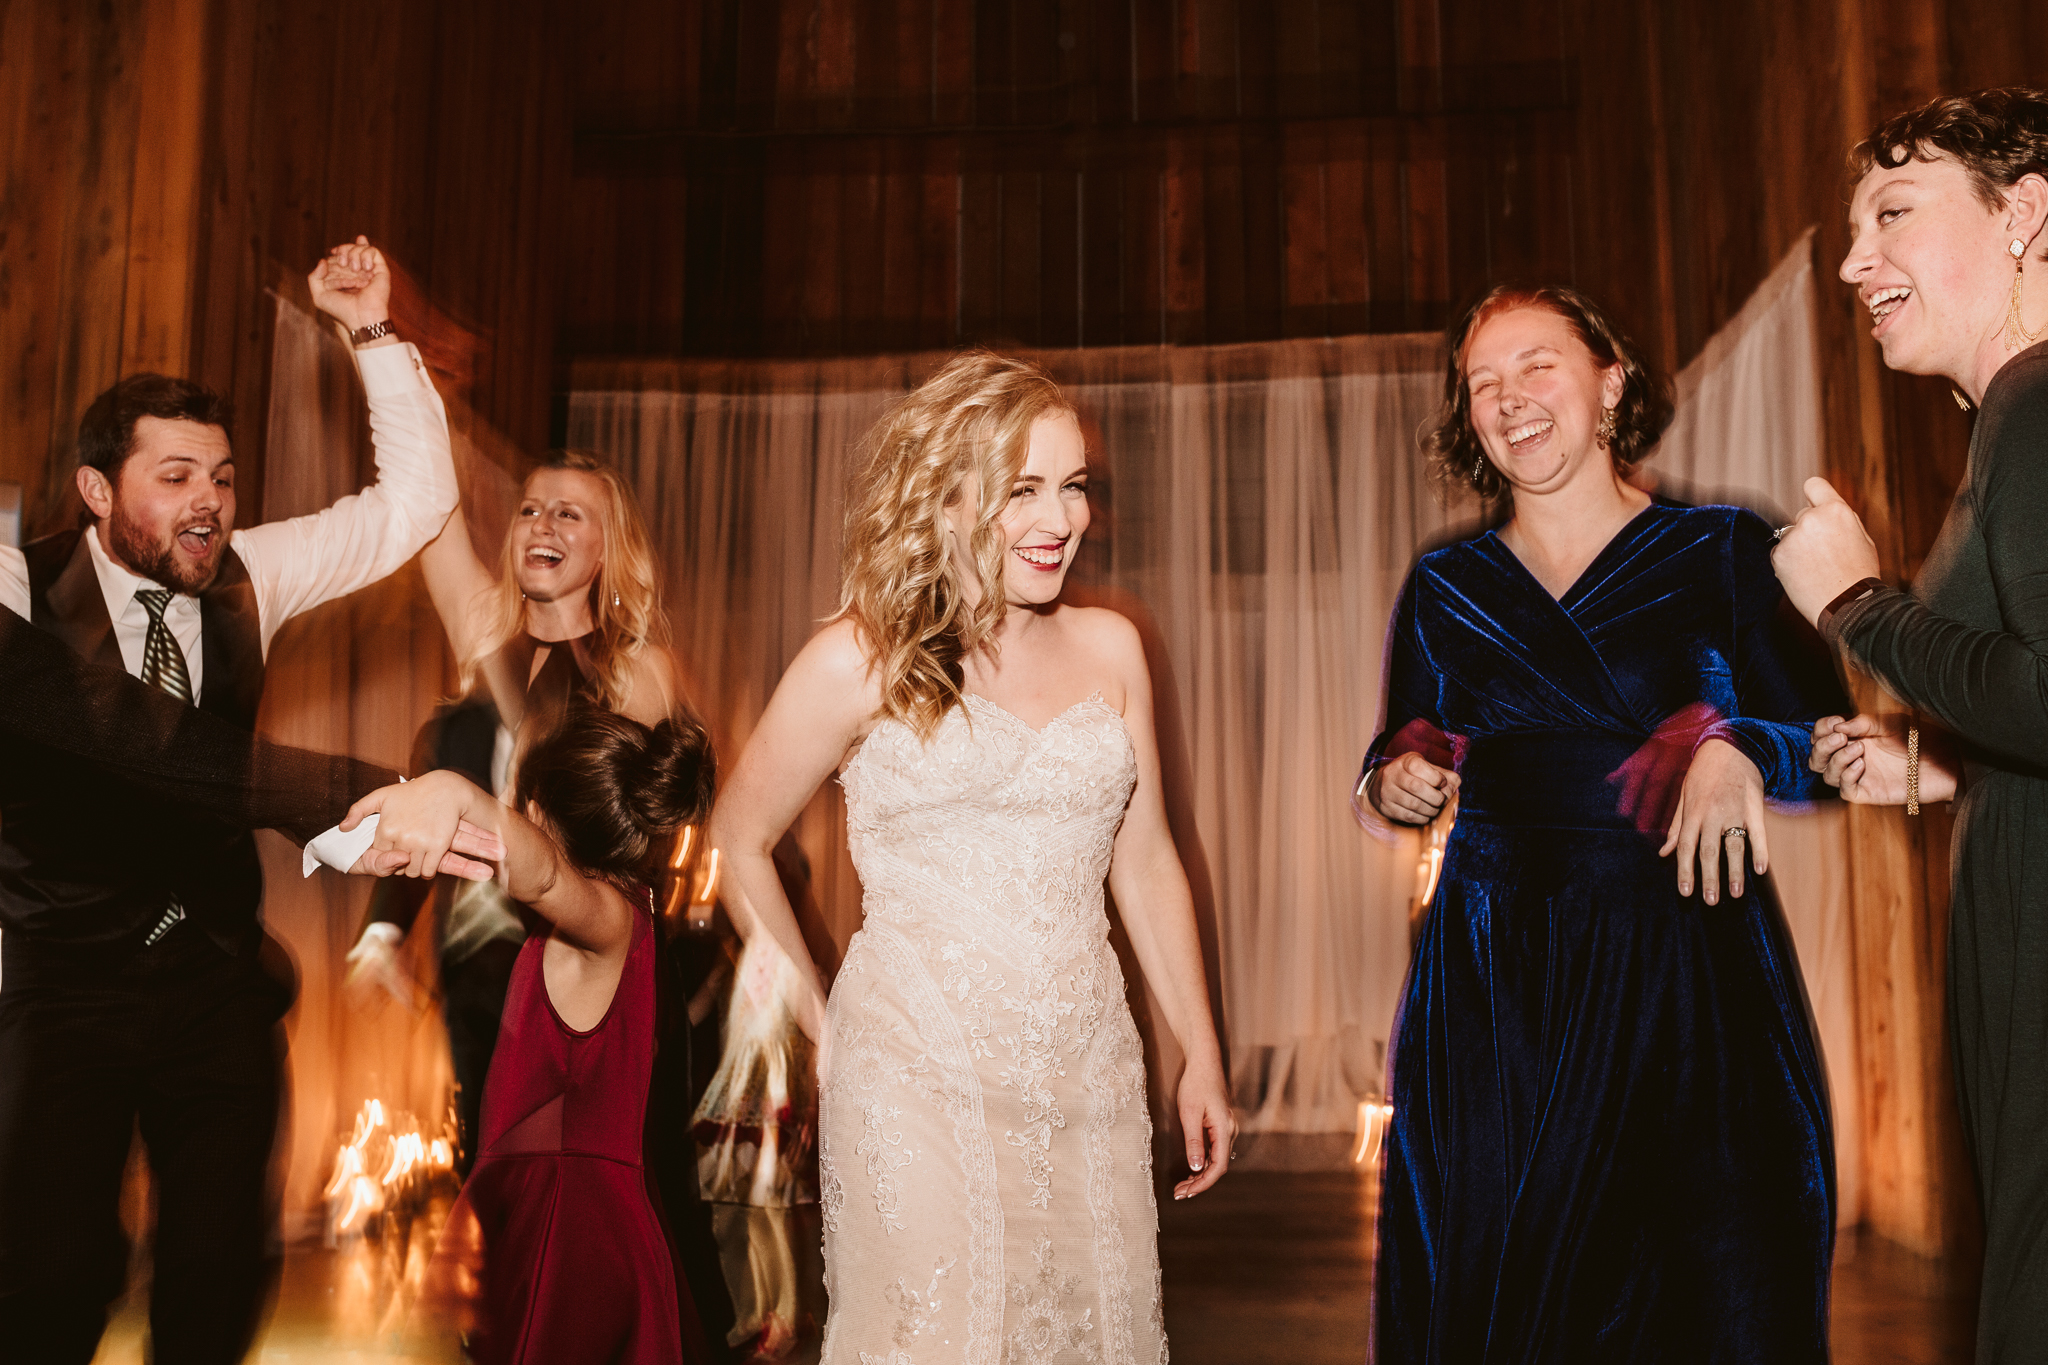 0173 Ariana Jordan Photo - Cameron & Lauren's Wedding at Talon Winery  8069.jpg